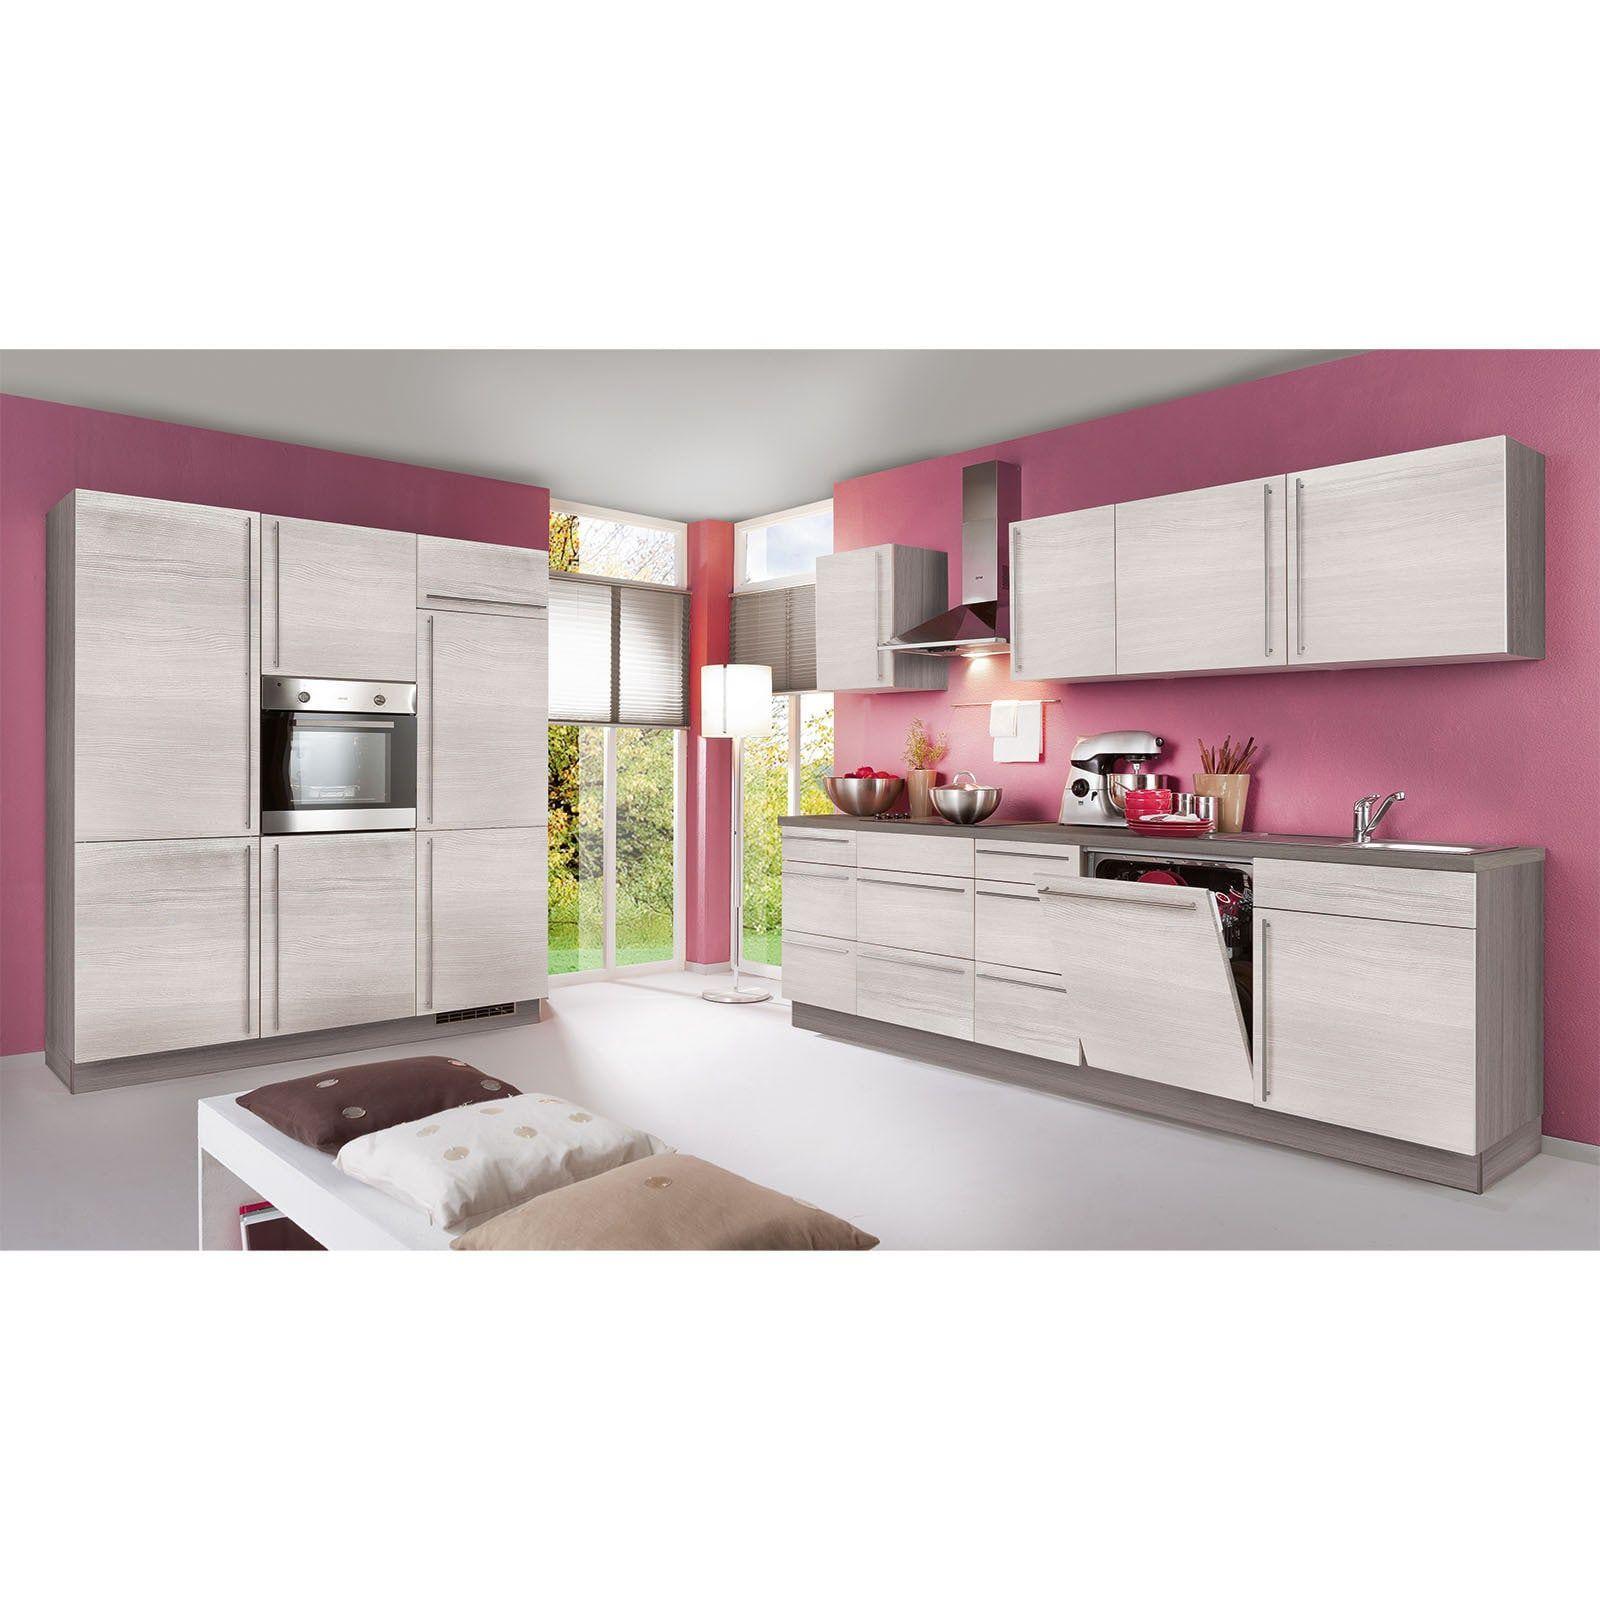 Küche Weiß Eiche Grau: Eiche Weiß-Eiche Grau